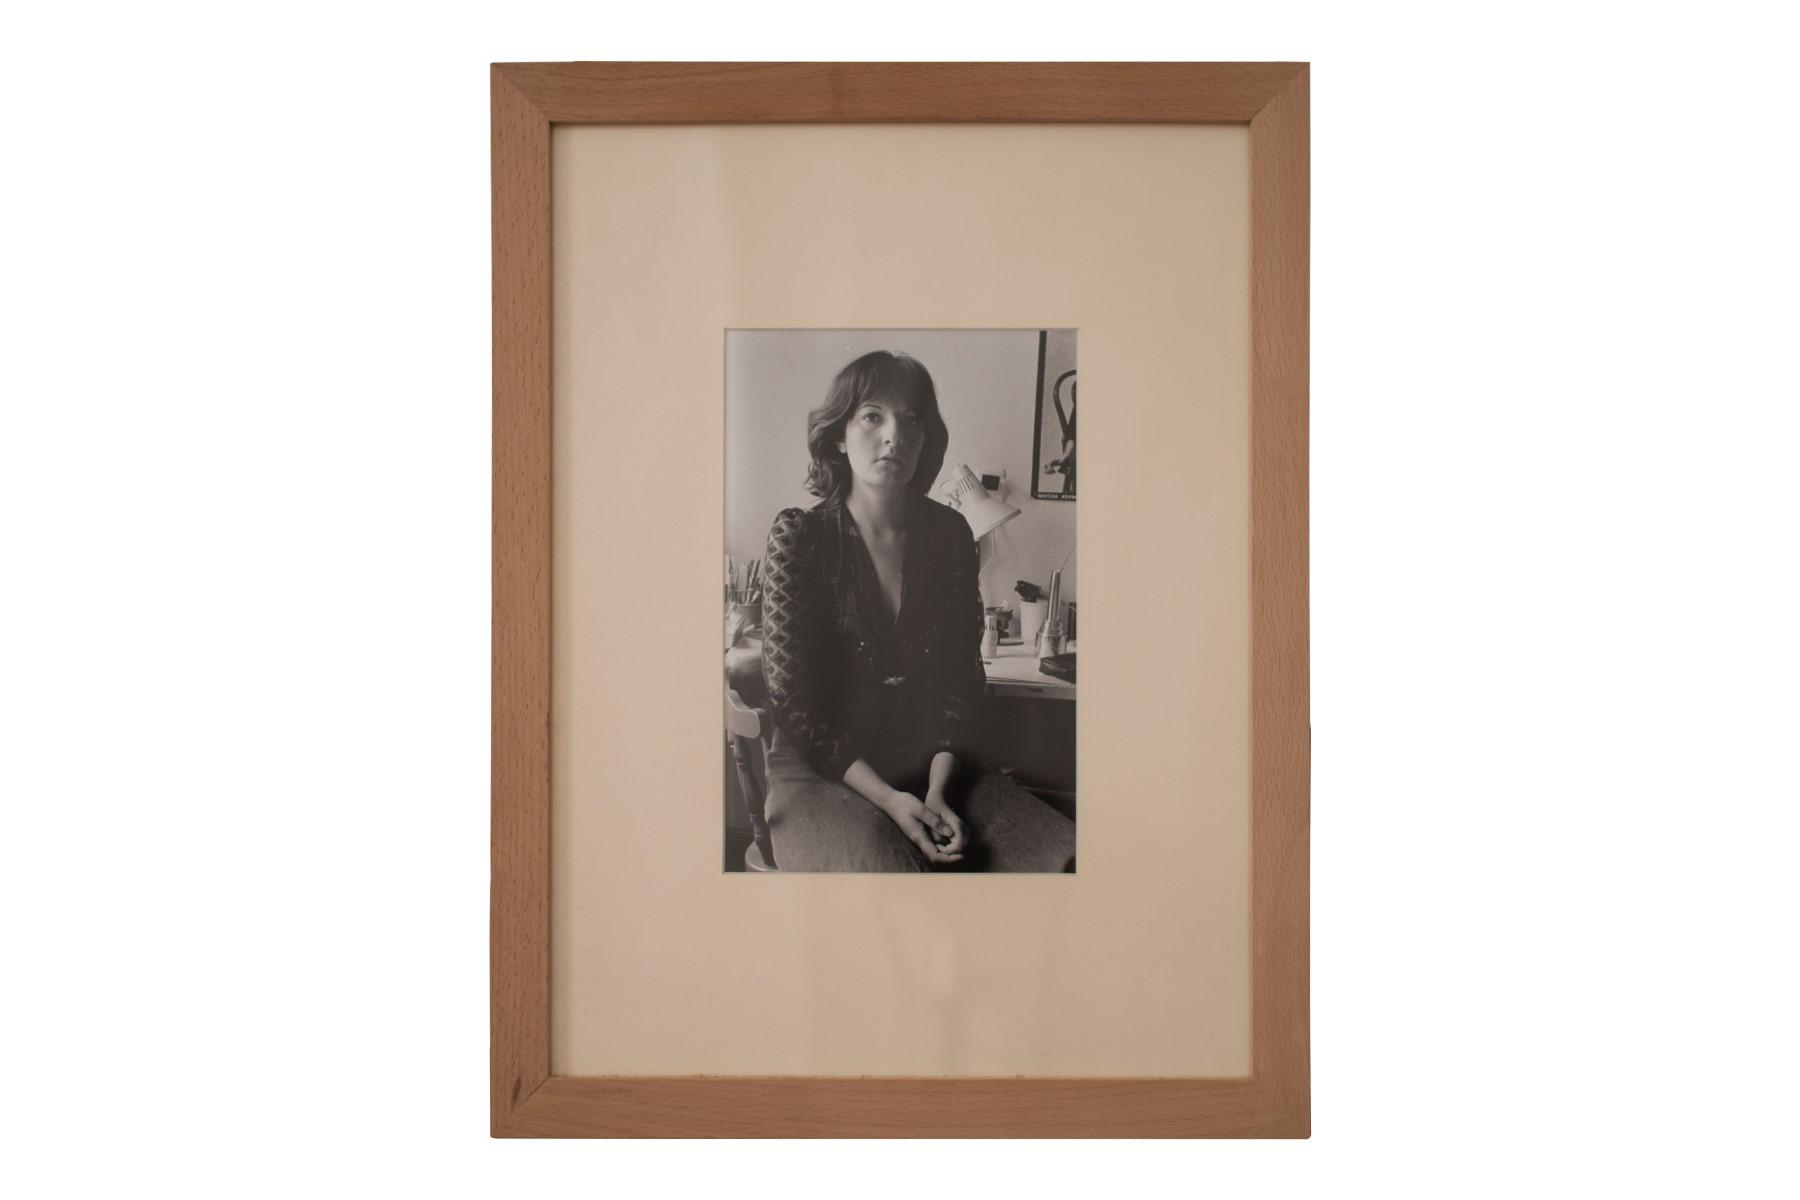 #110 Milan Jozic, Portrait of Marina Abramovic, Photo | Milan Jozic, Porträt von Marina Abramovic, Foto Image